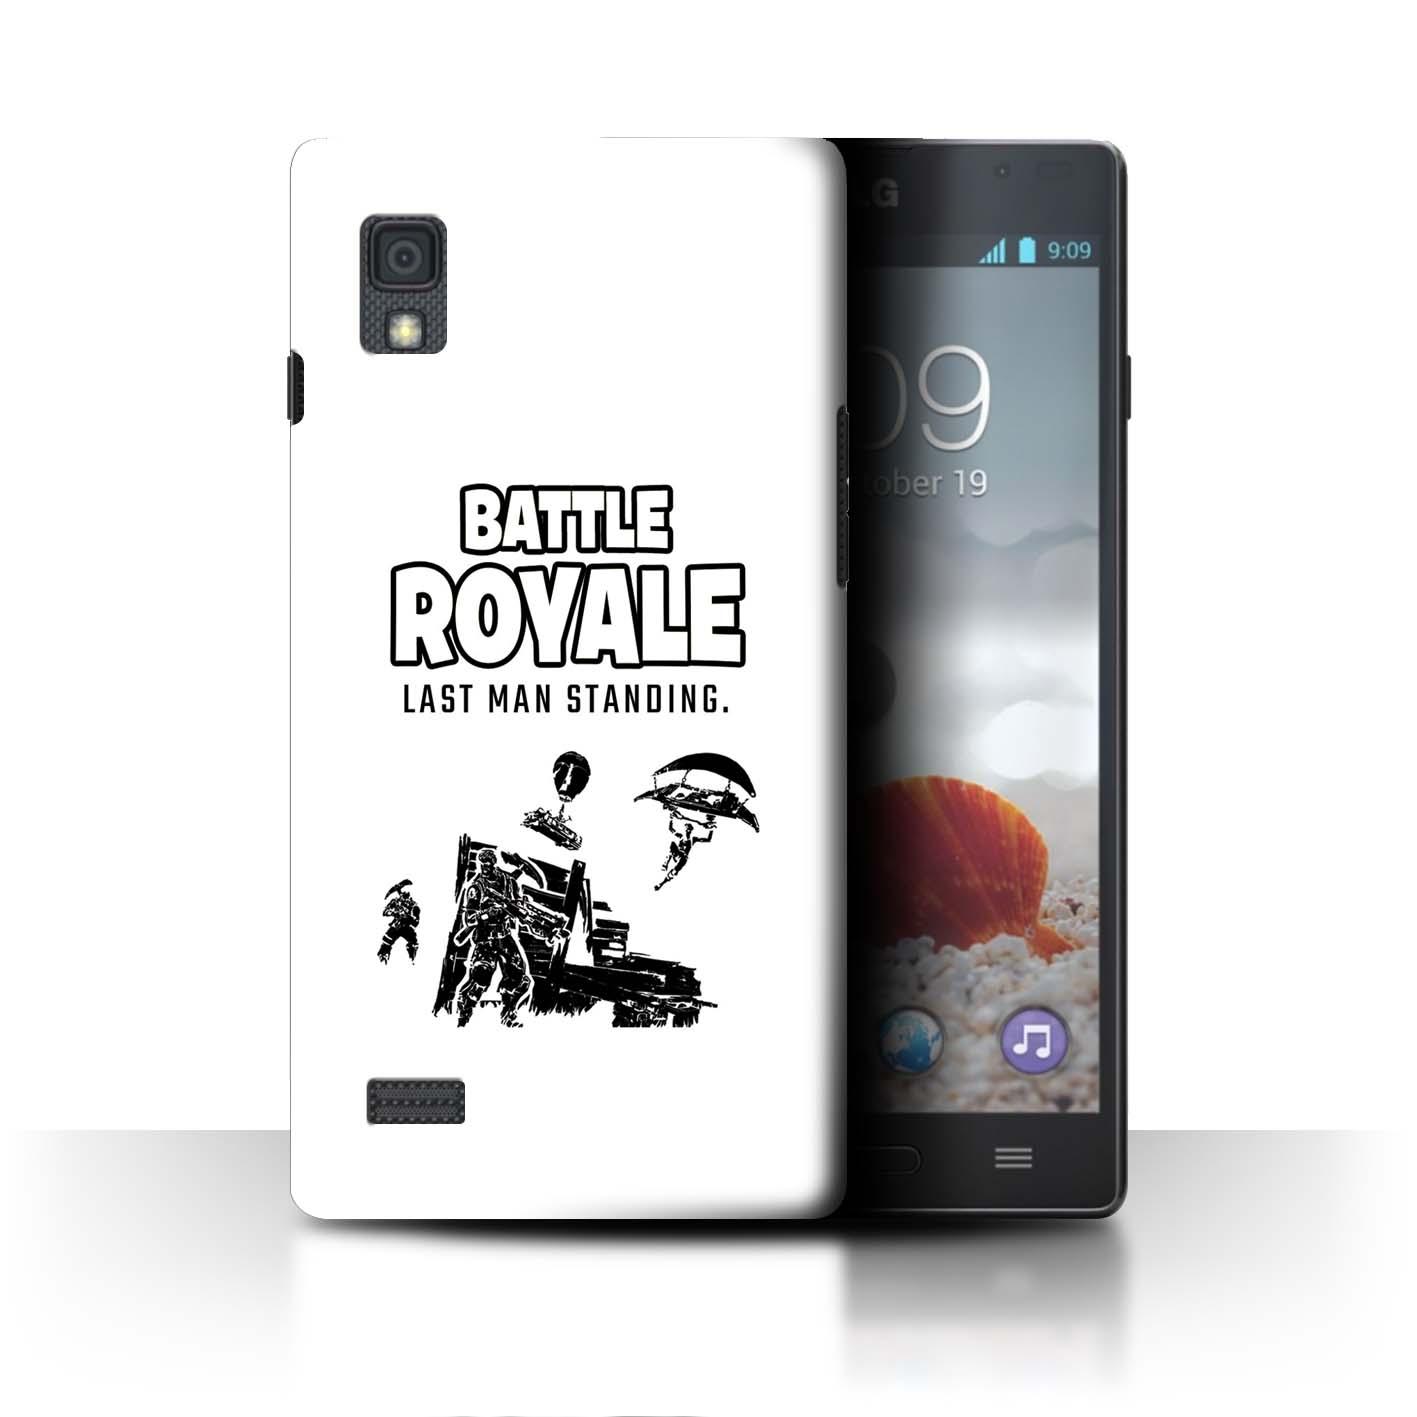 STUFF4-Phone-Case-Back-Cover-for-LG-Optimus-L9-P760-FN-Battle-Royale